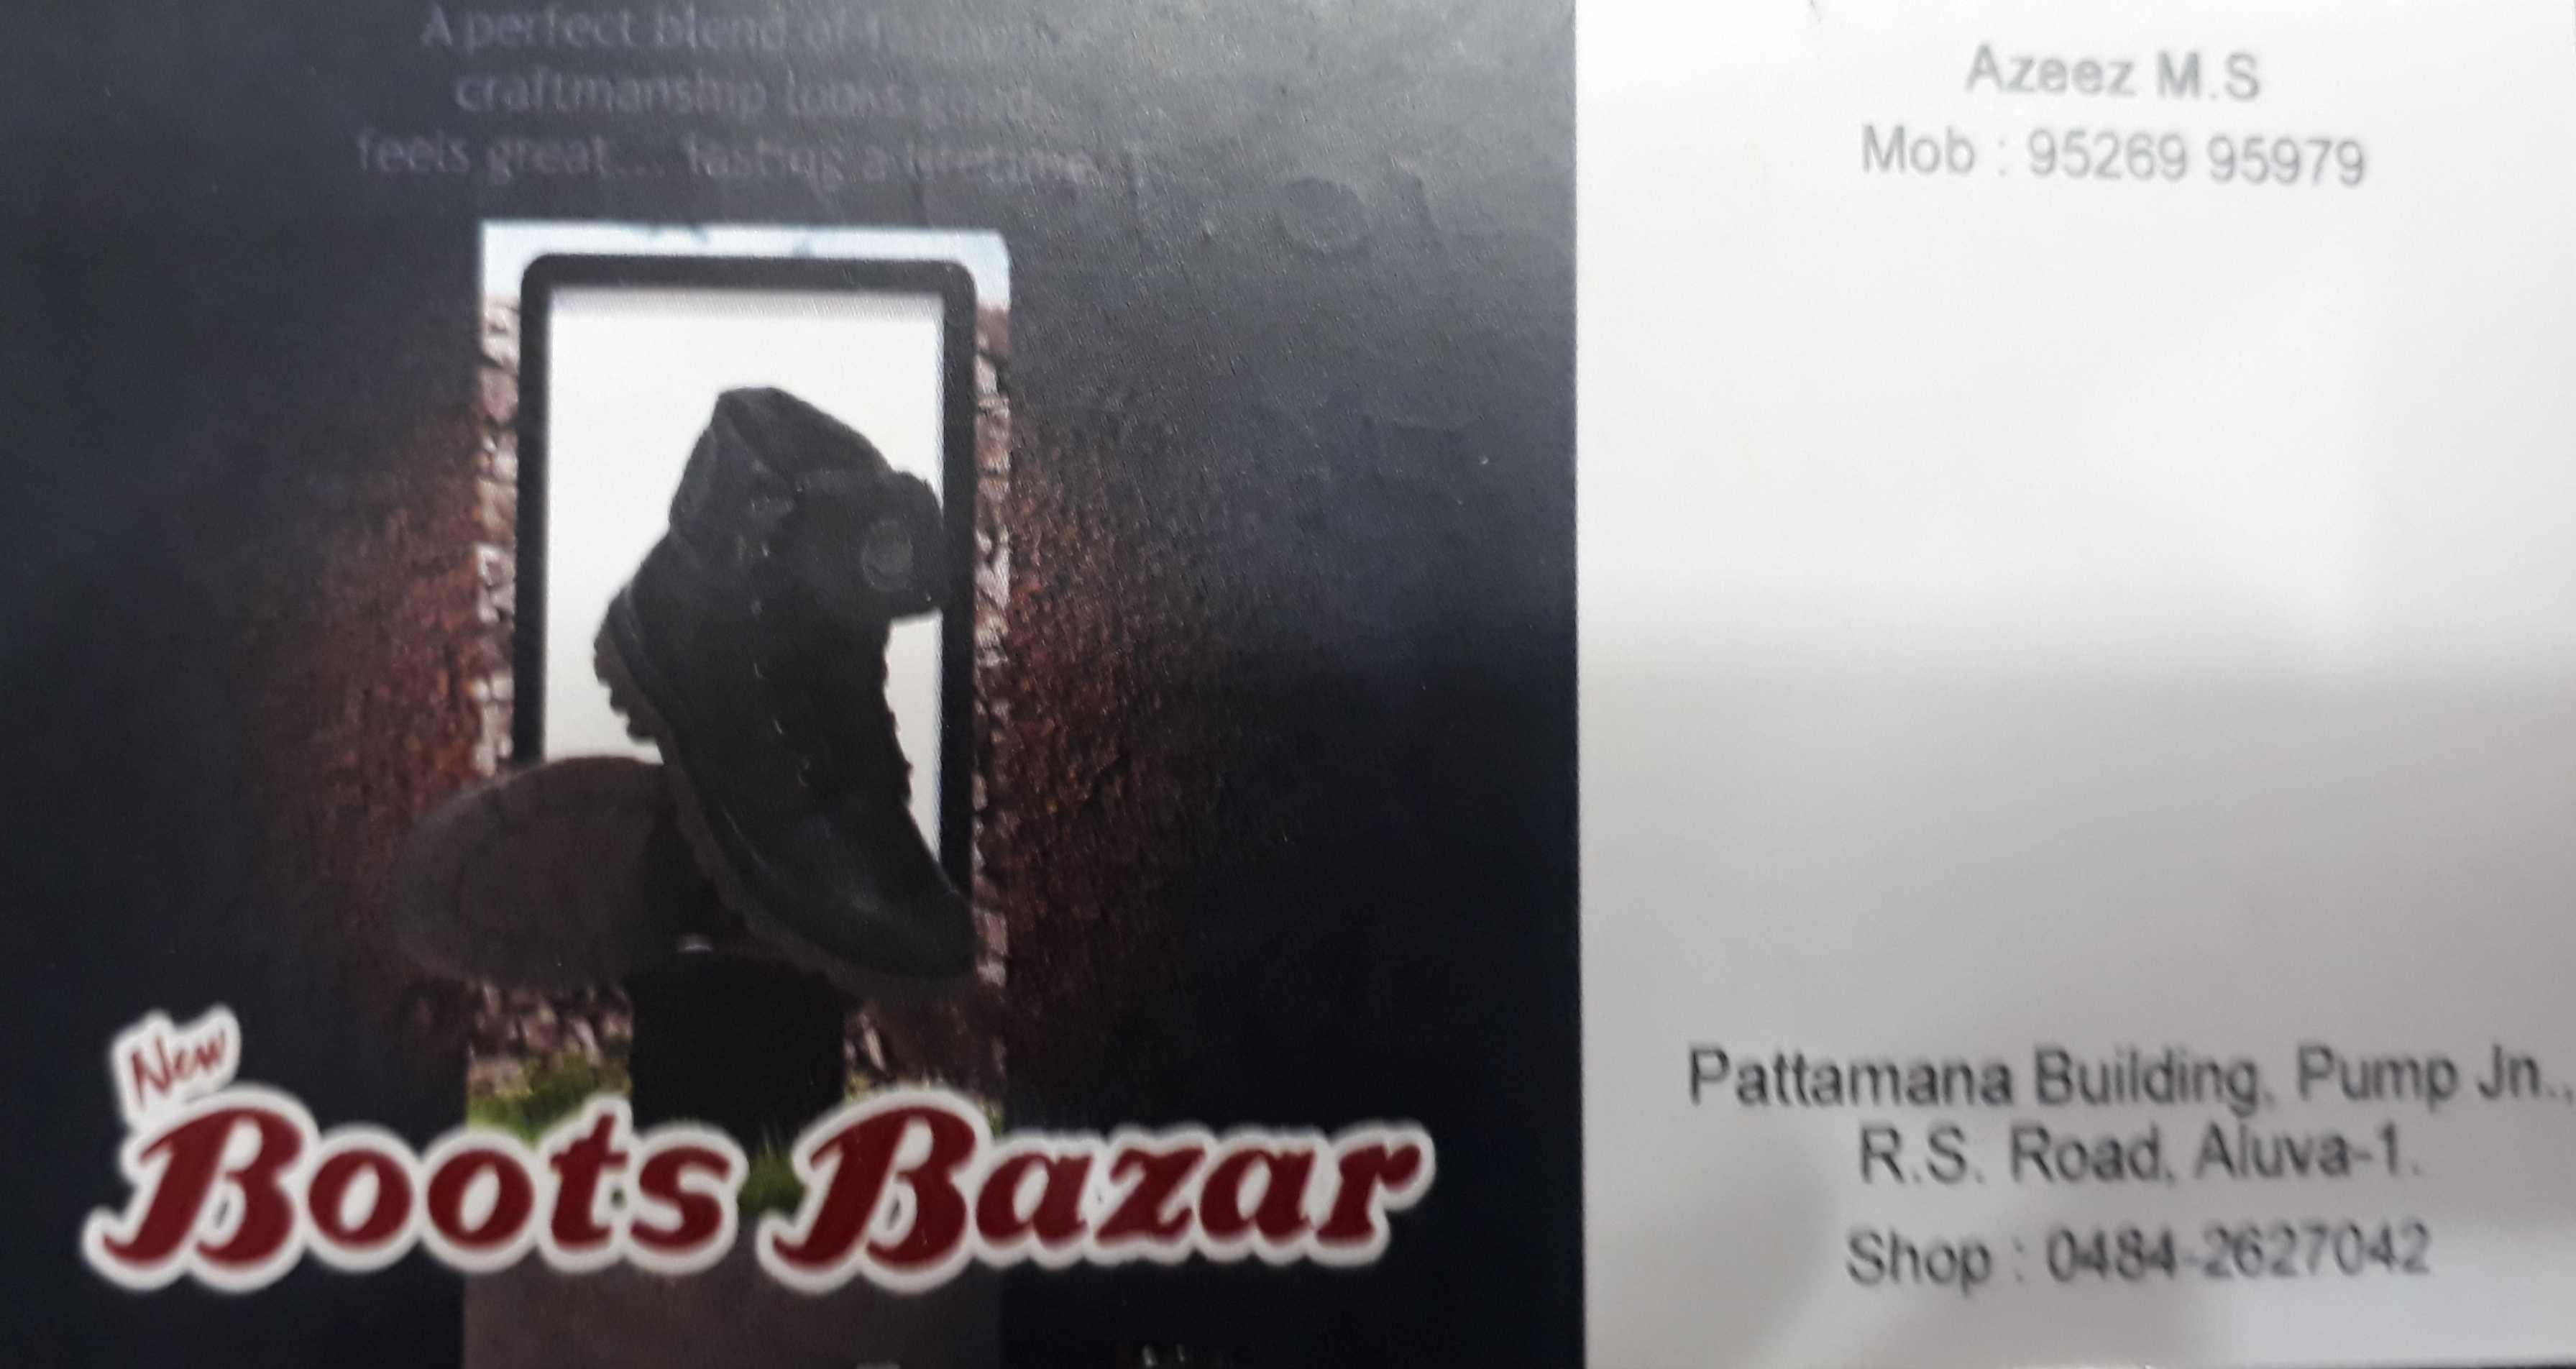 Boots Bazar, FOOTWEAR SHOP,  service in Aluva, Ernakulam